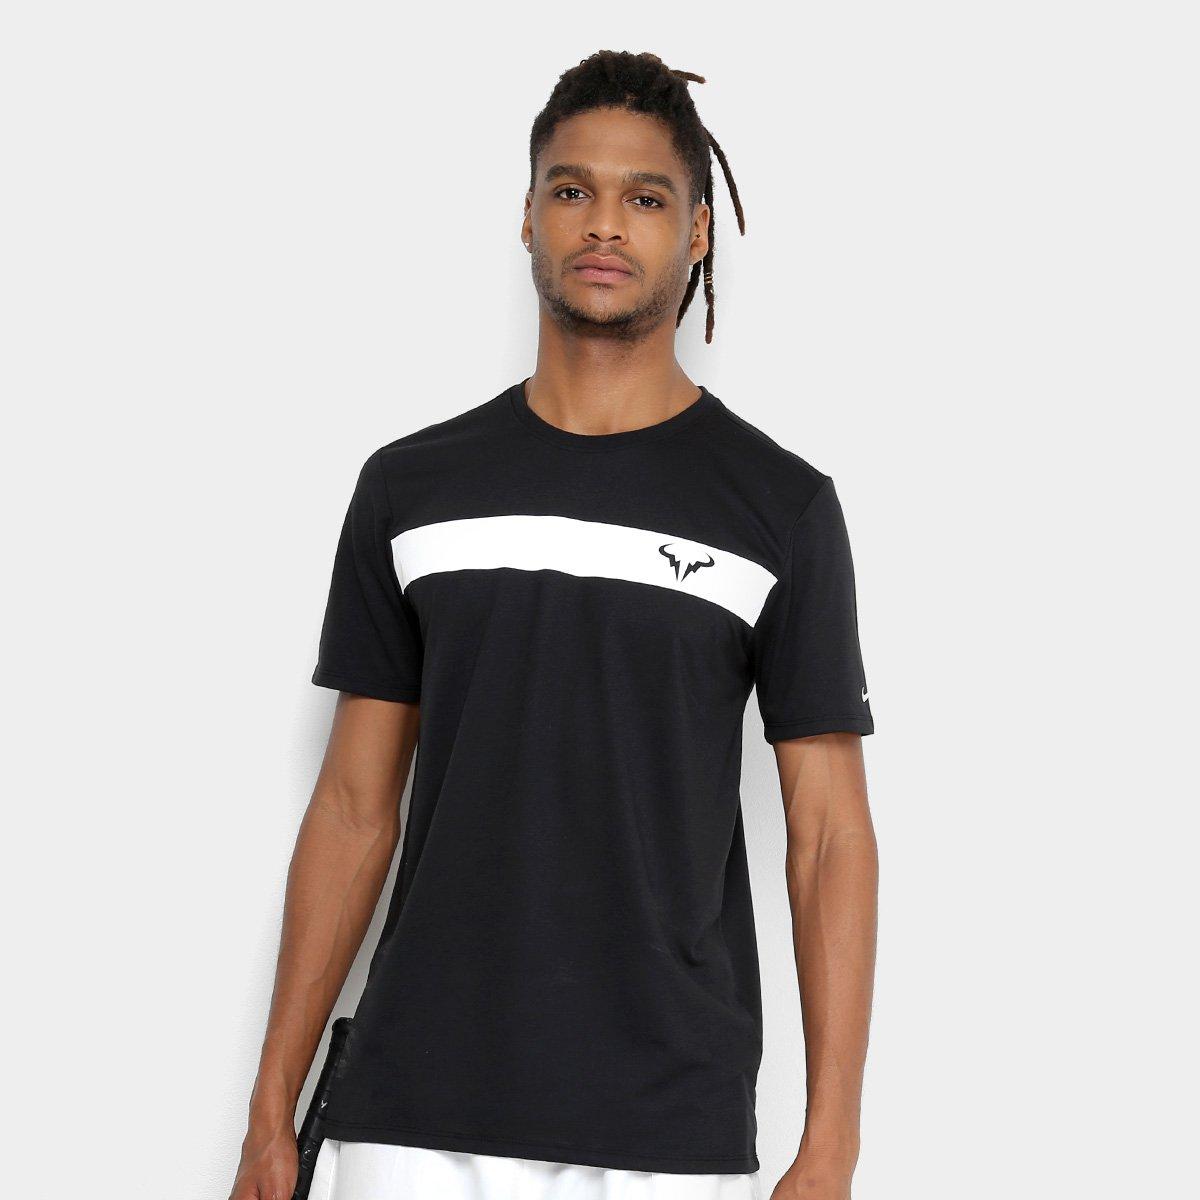 6e862e0de8 Camiseta NikeCourt Dry Rafa Masculina - Preto e Branco - Compre ...